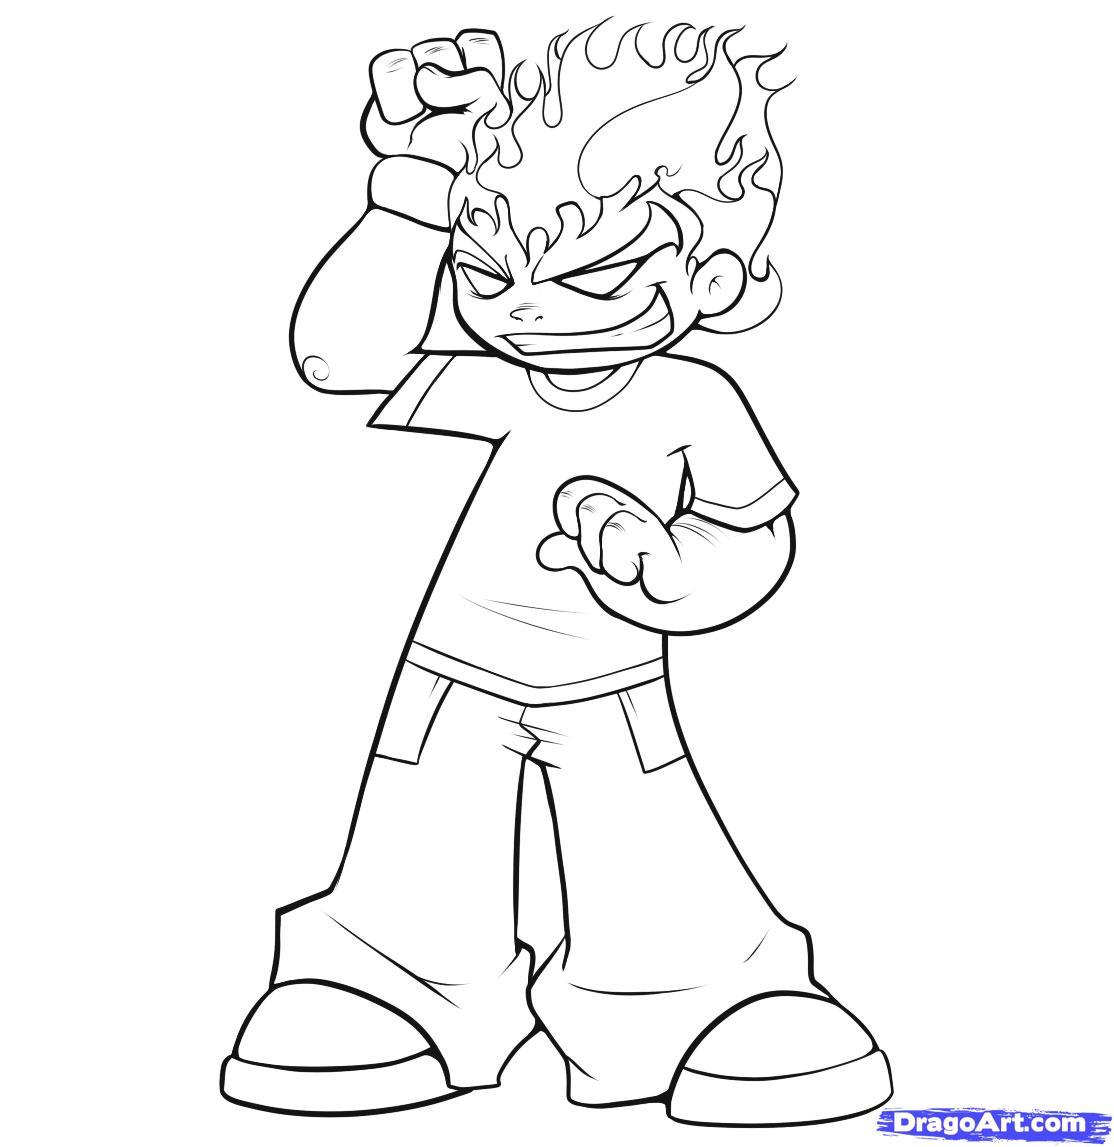 1114x1147 Drawing Drawings Disney Cartoon Characters Plus Drawings